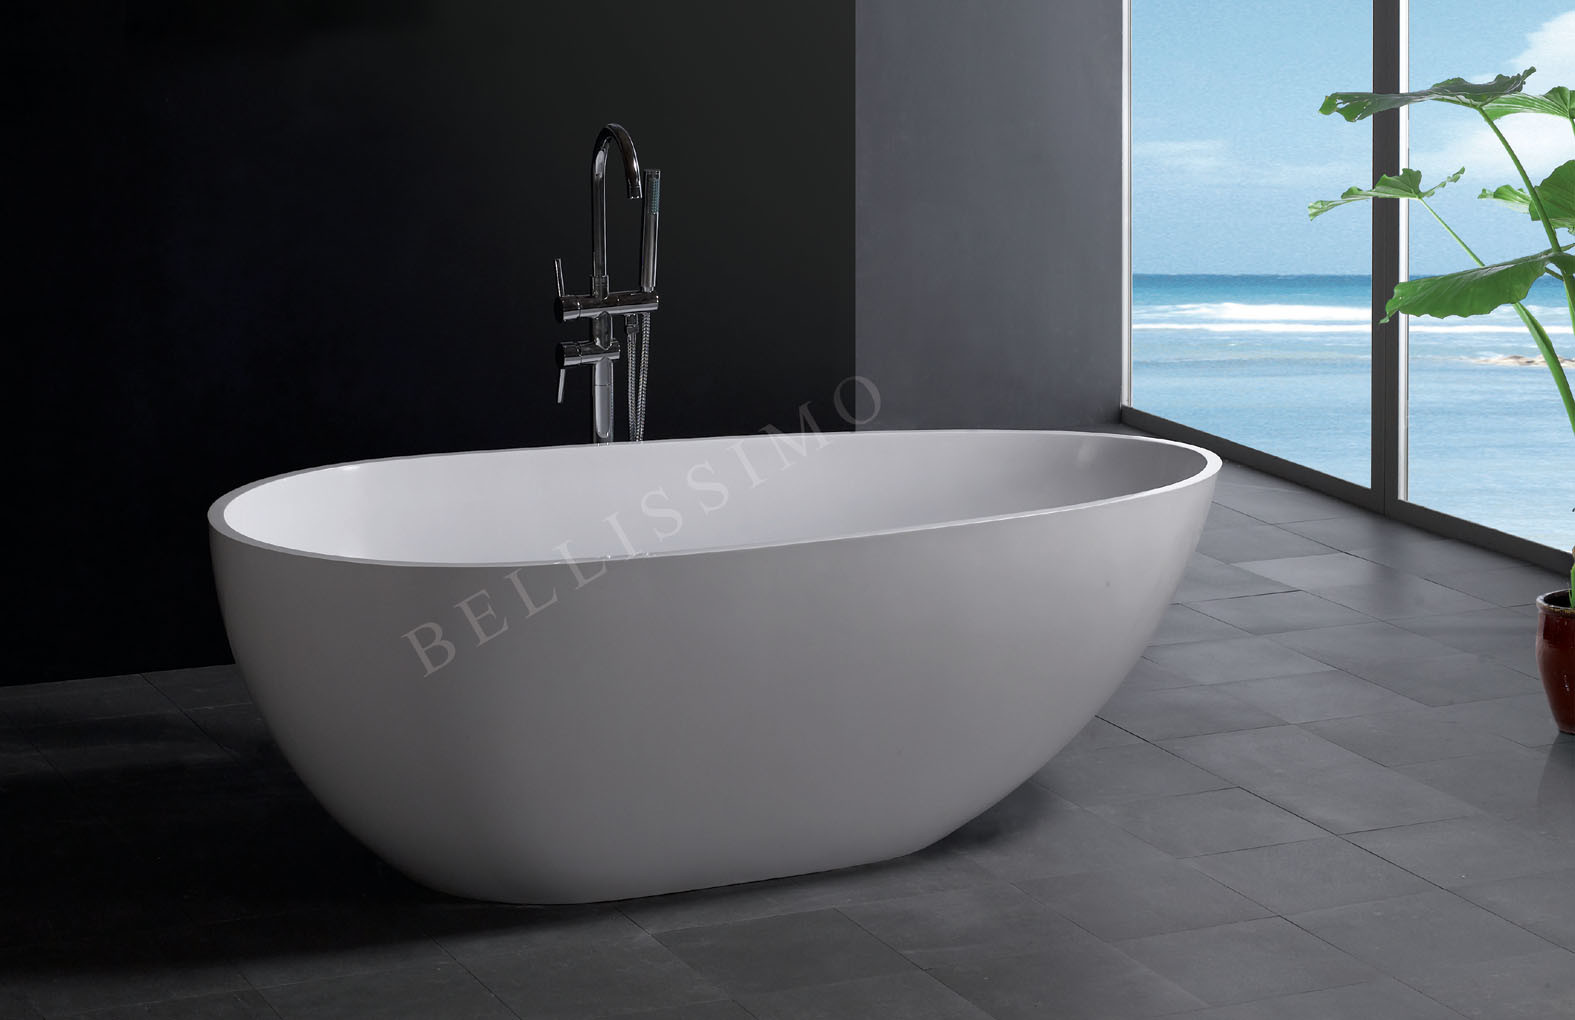 China Stone Bathtub Bs 8608 China Bathtub Acrylic Bathtub